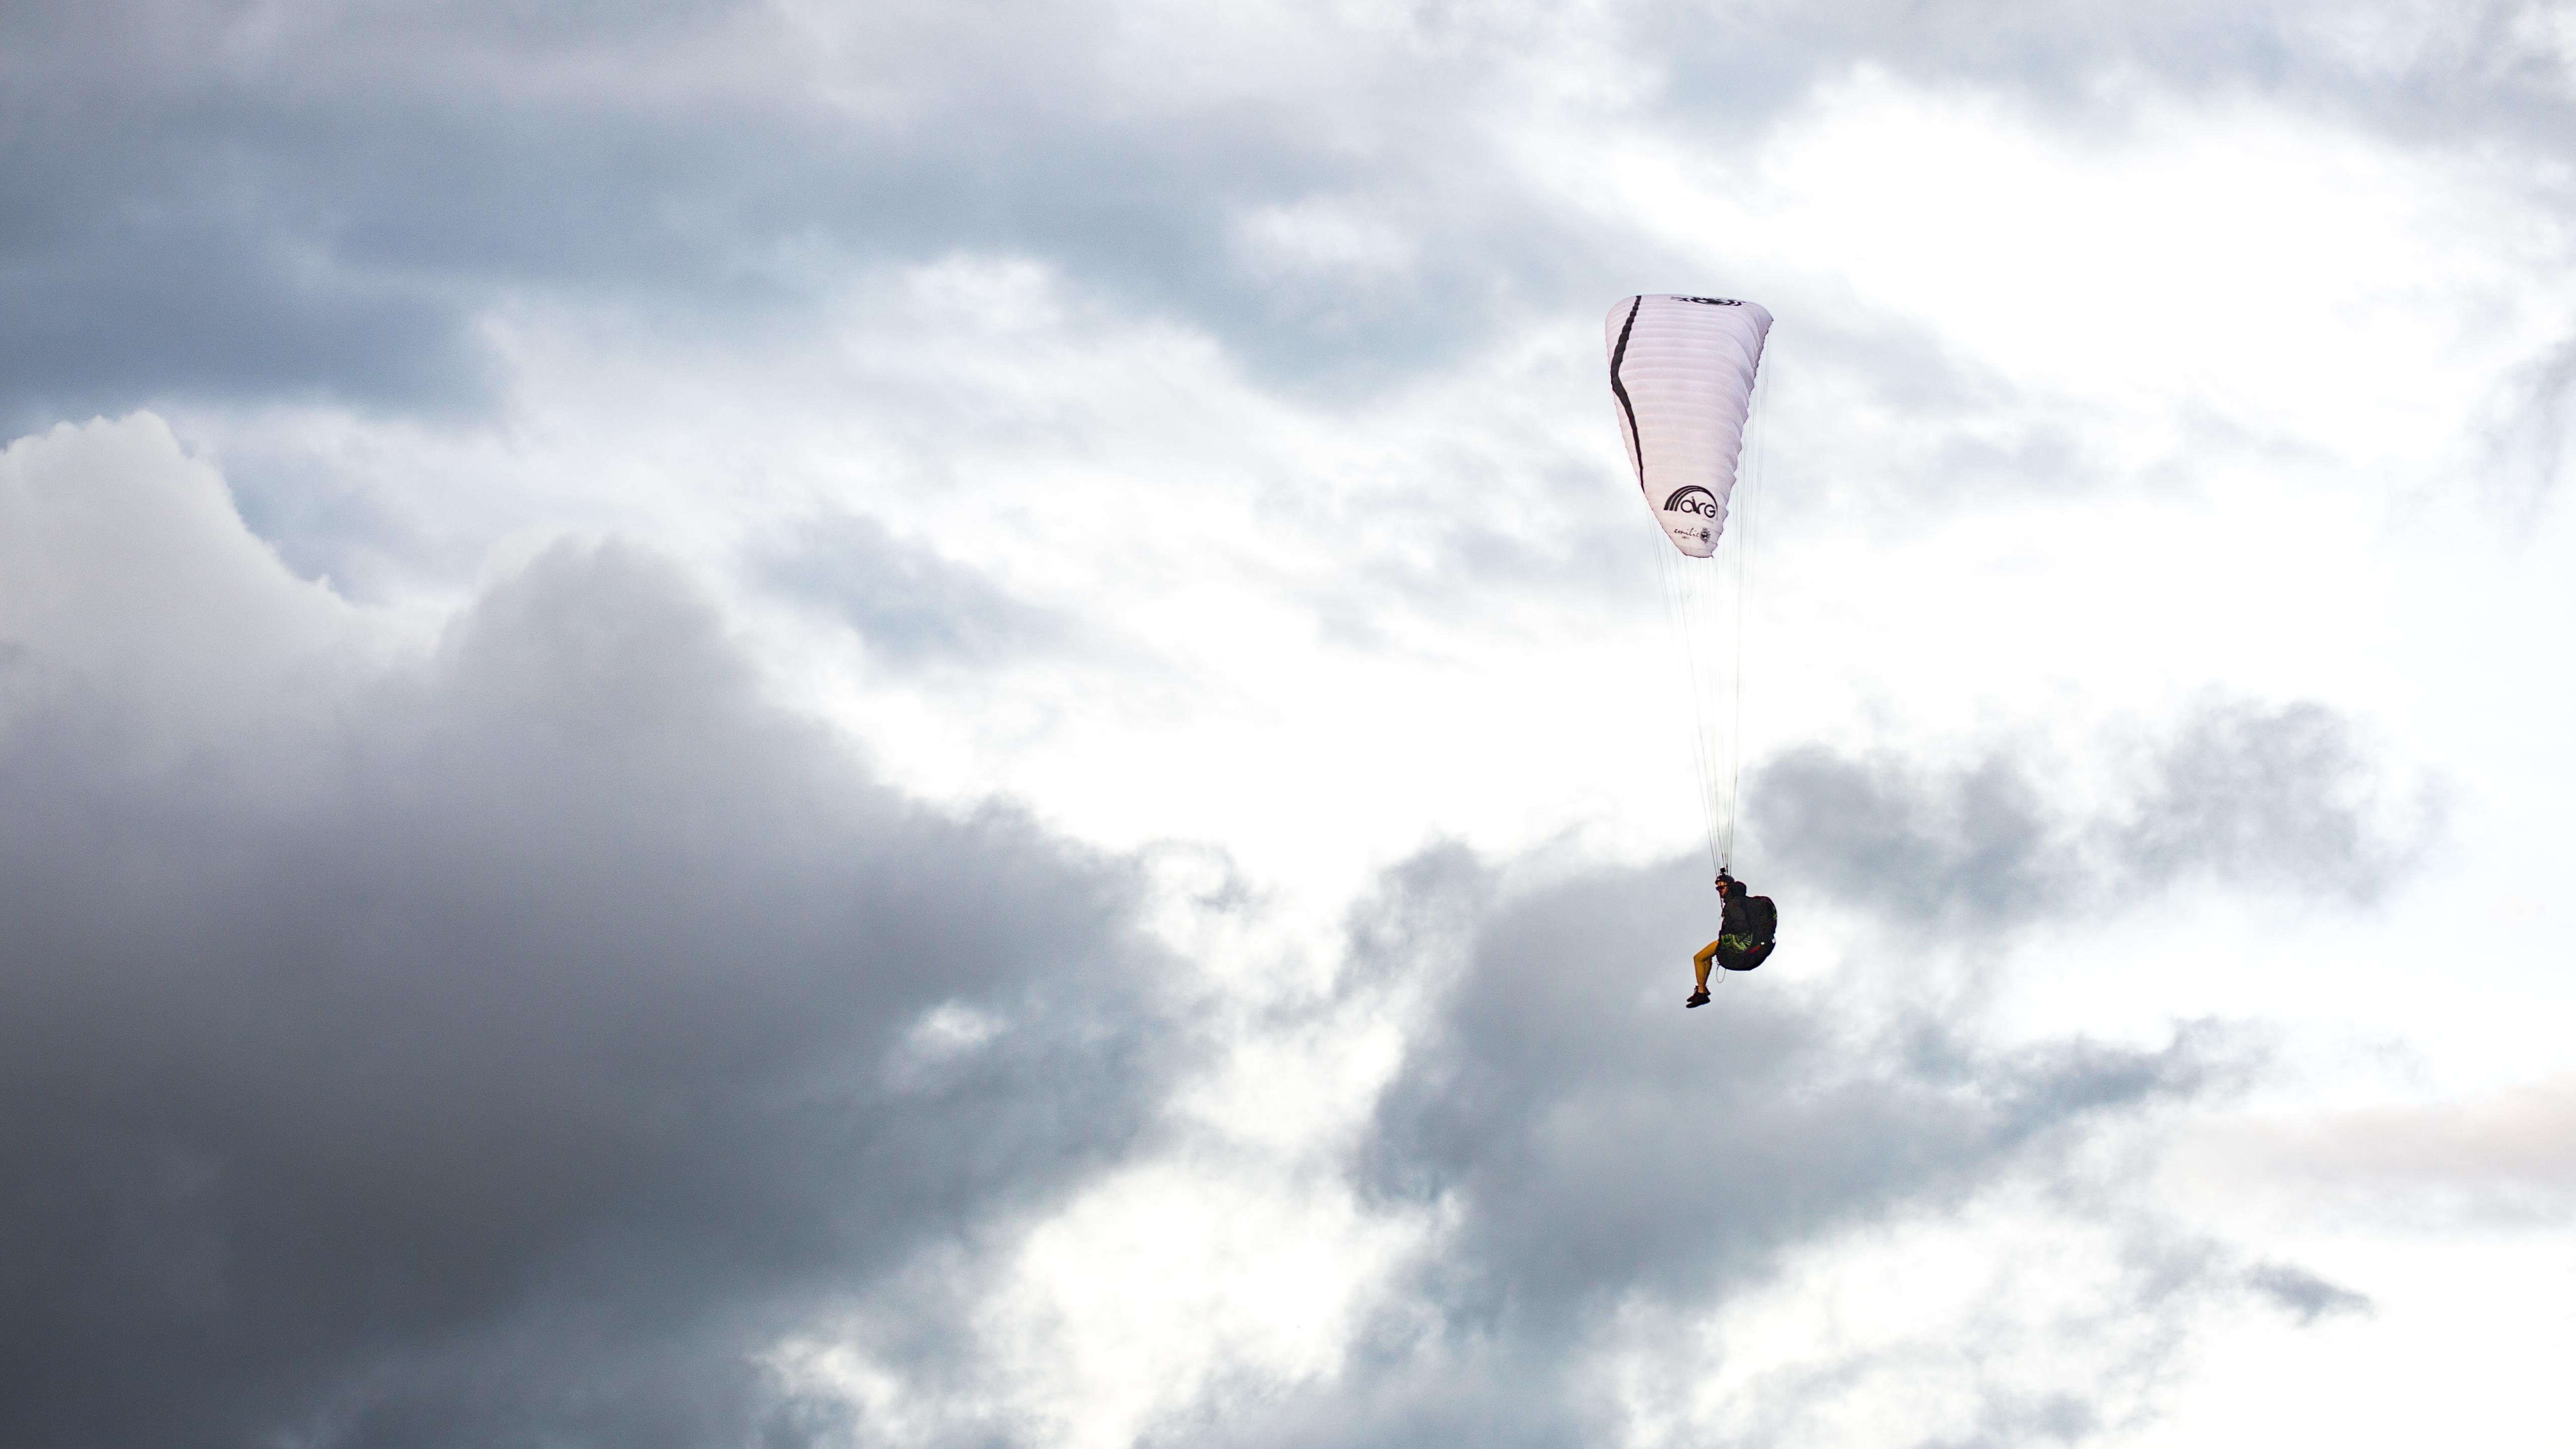 File:2017-07 Natural Games Paragliding 15 jpg - Wikimedia